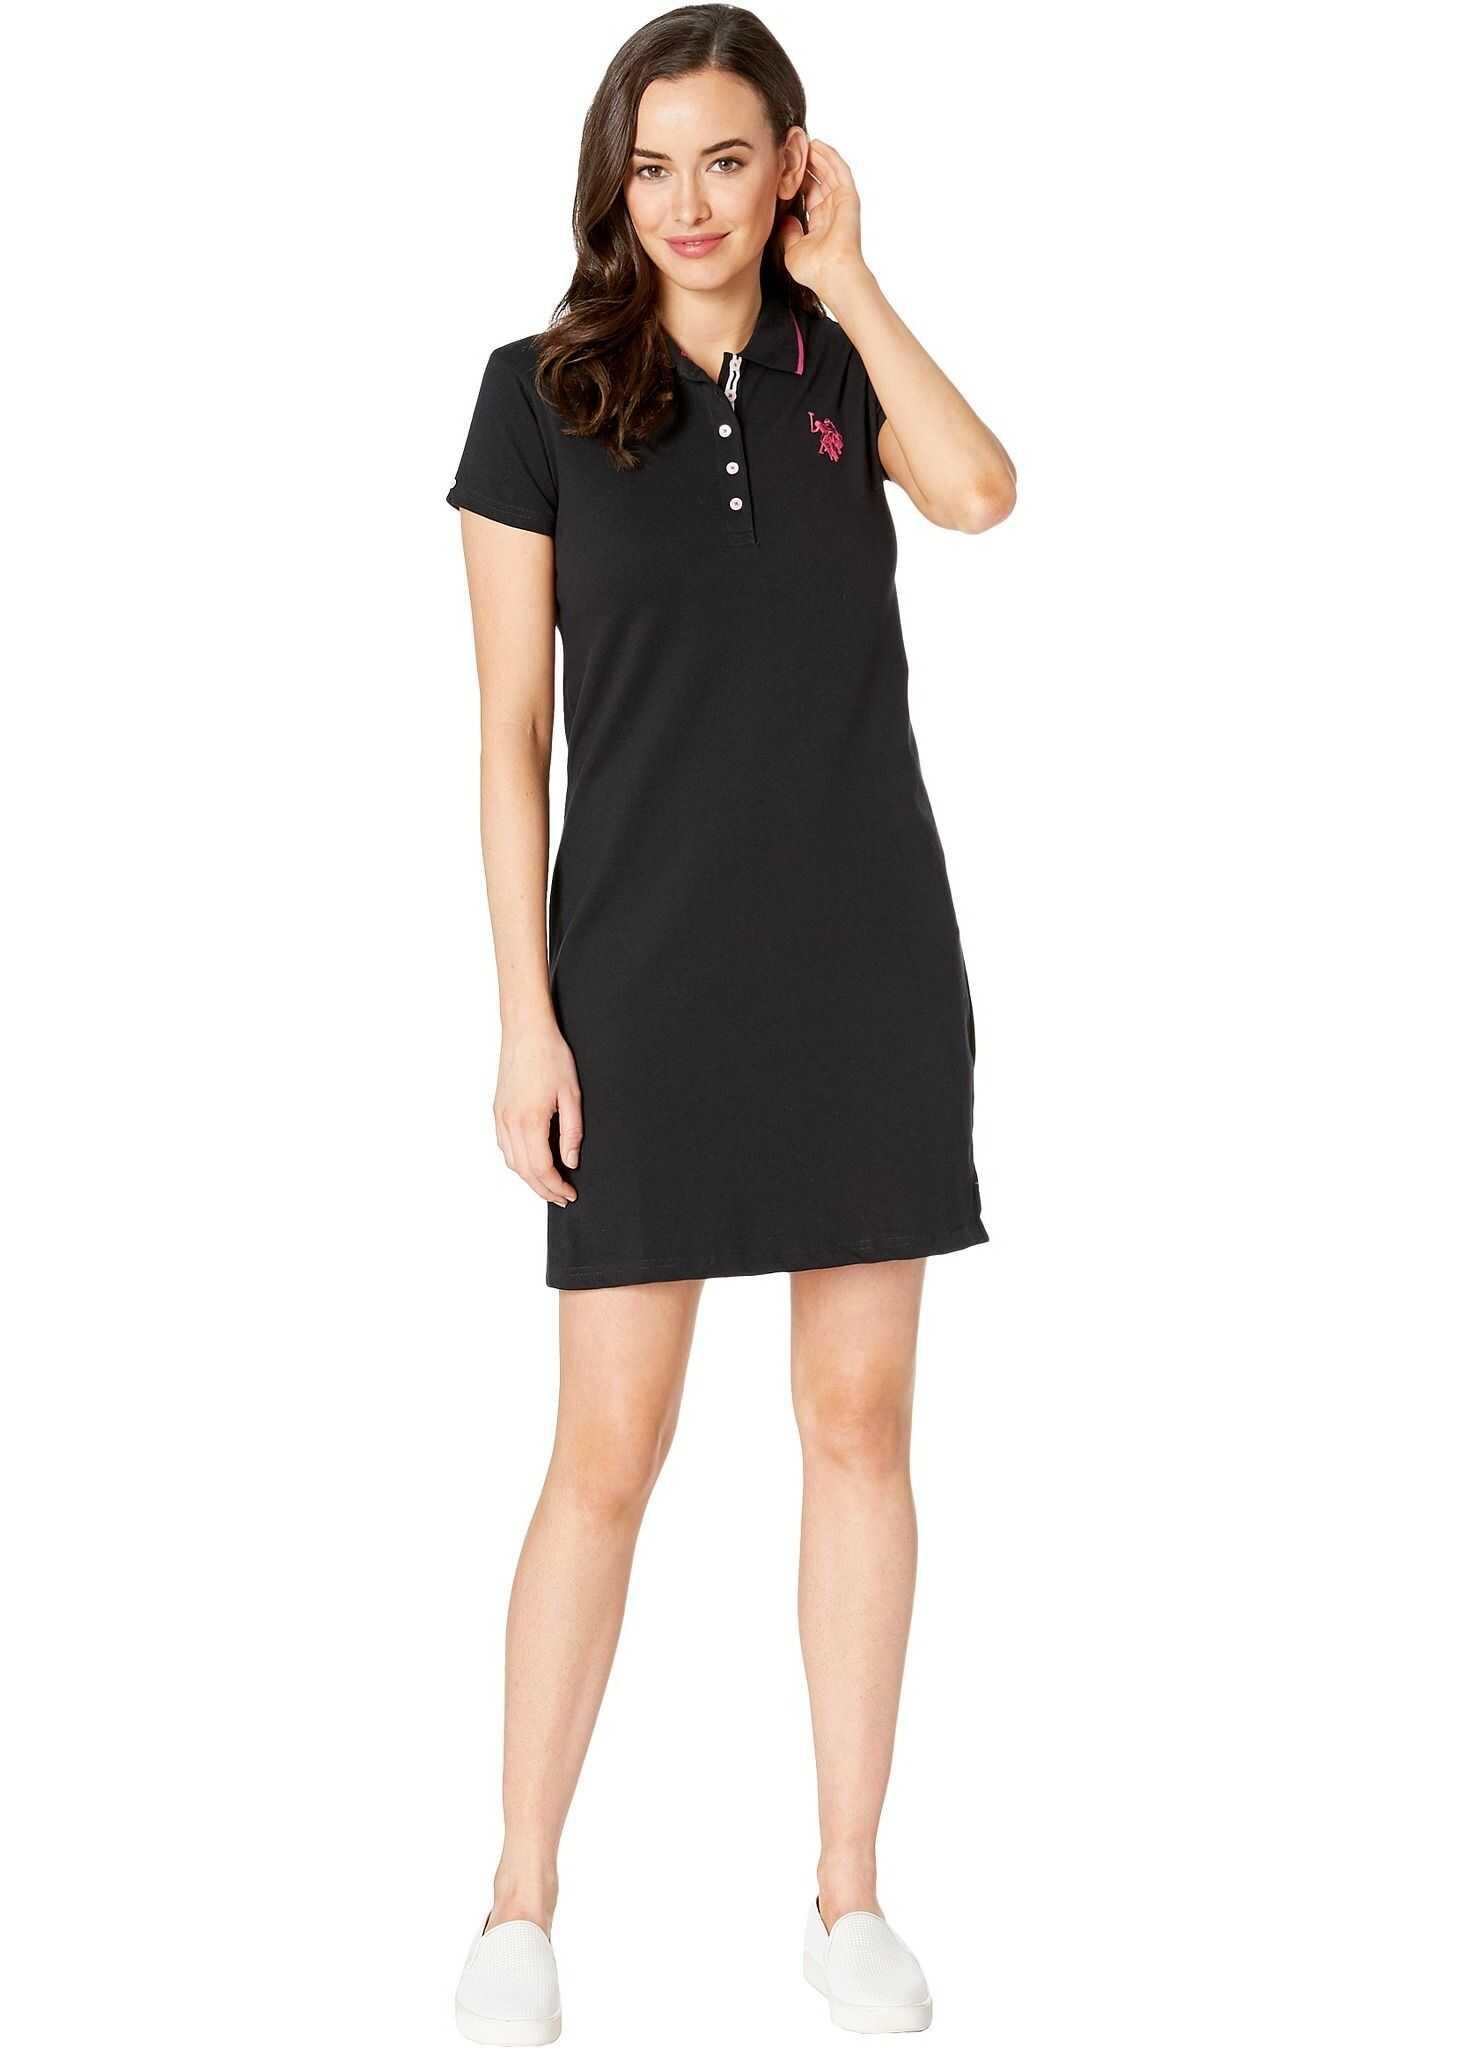 U.S. POLO ASSN. Plain Polo Dress Anthracite